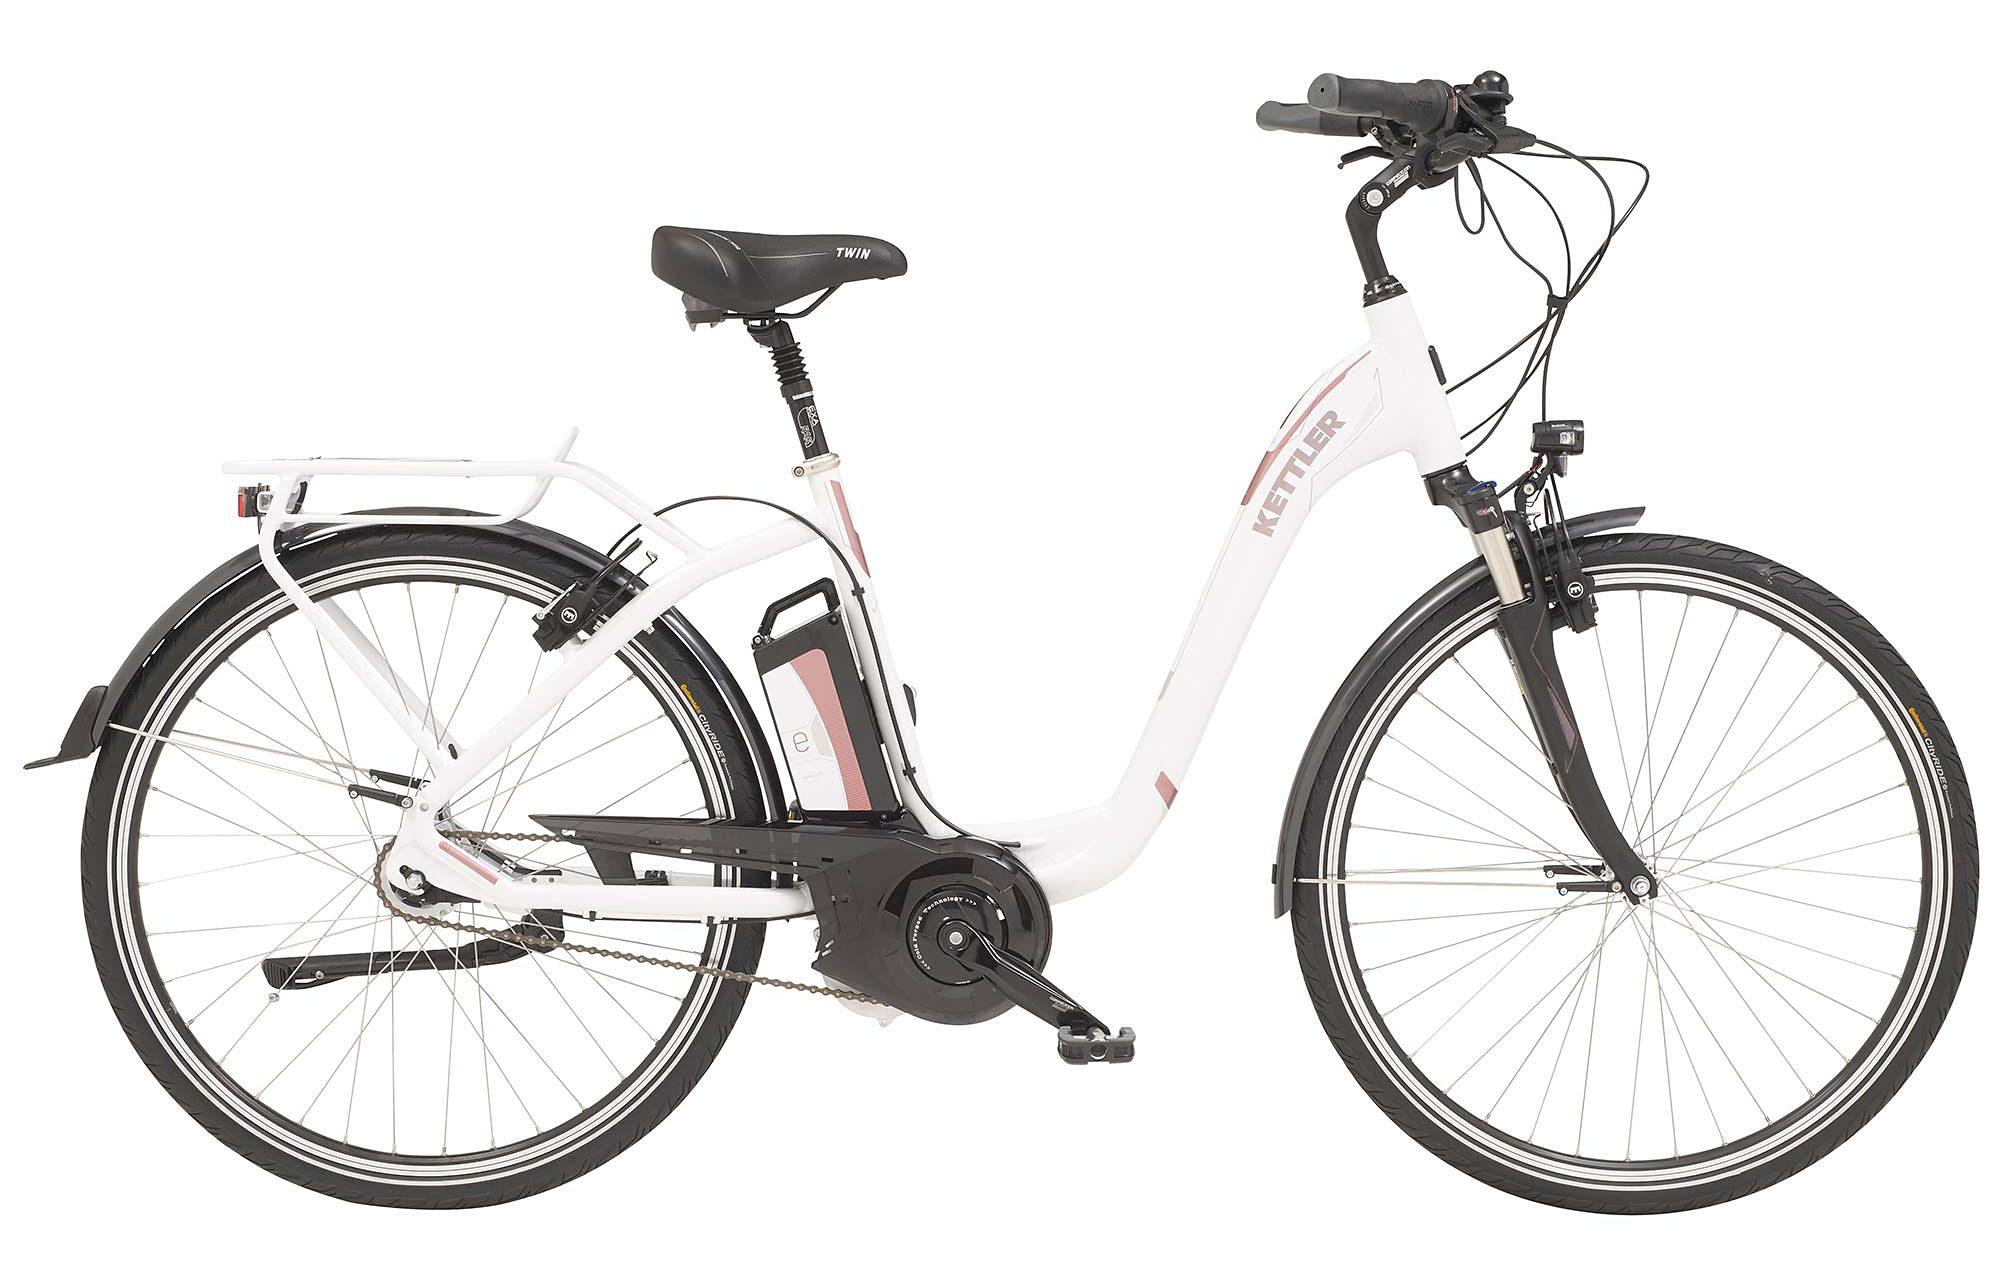 Kettler E-City-Bike, Damen, 28-Zoll, 7 Gang Shimano, Rücktritt, 12 Ah, »Twin«